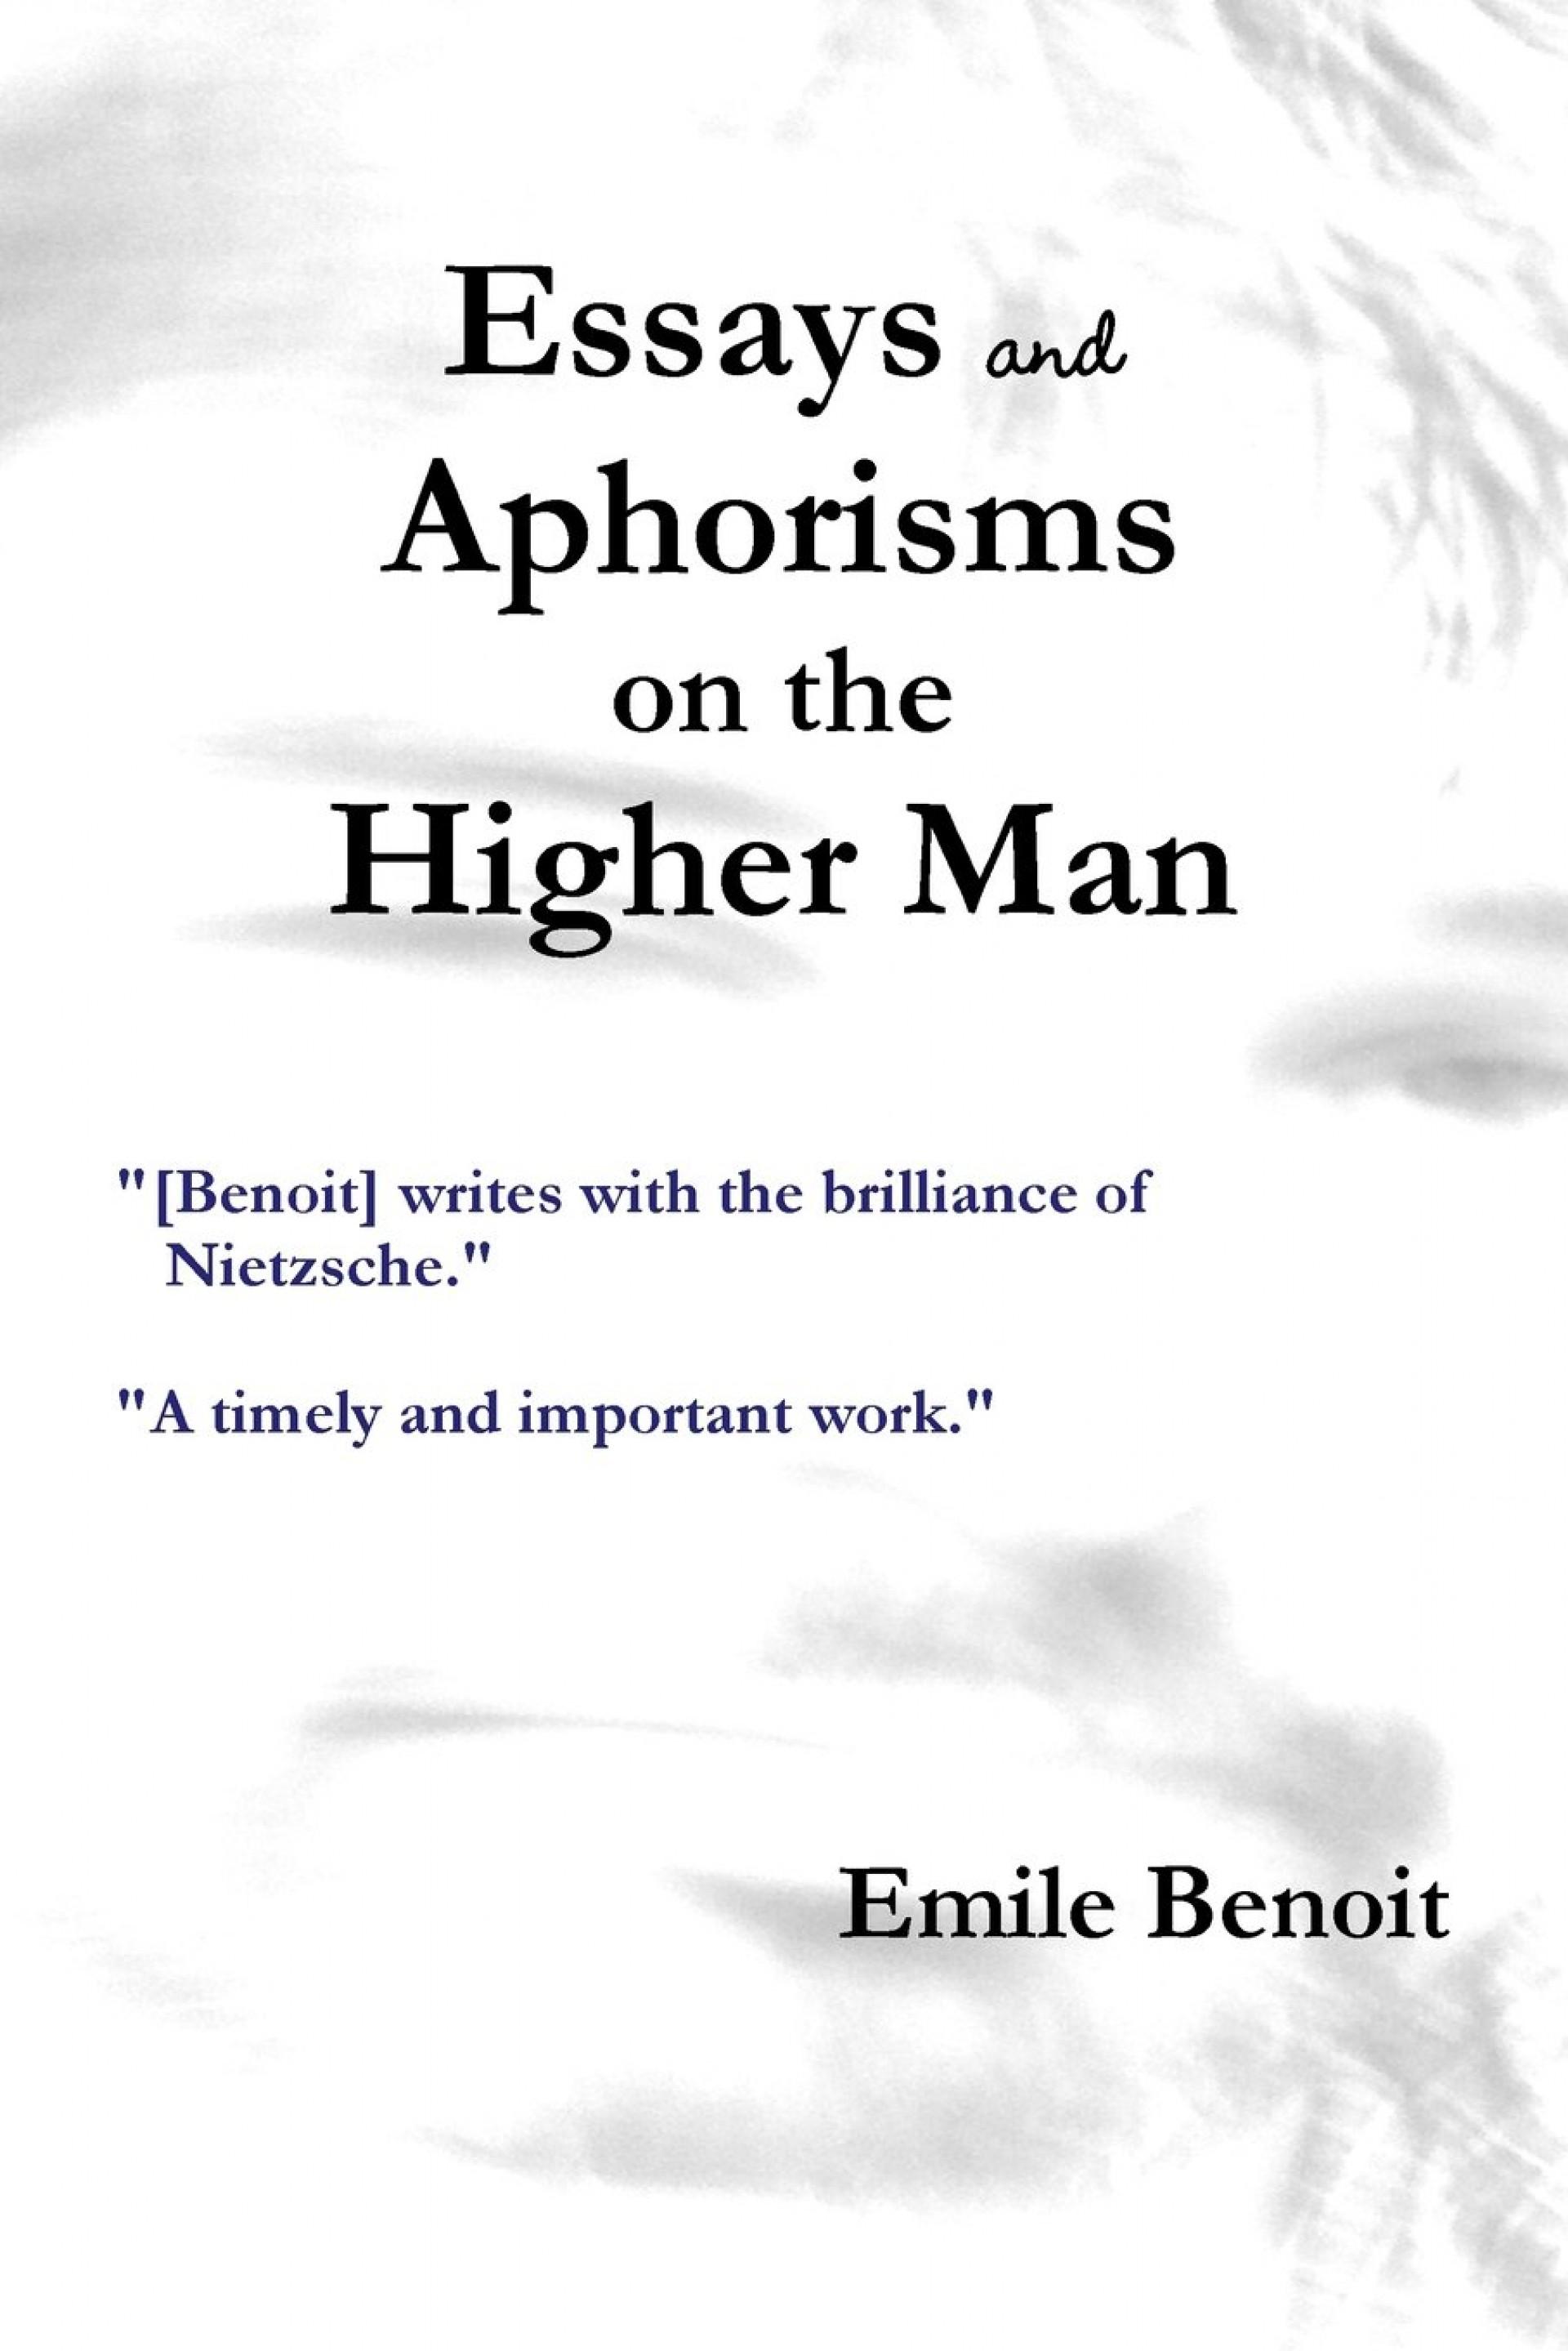 007 Essays And Aphorisms Essay Example Frightening Schopenhauer Pdf Wiki By Arthur 1920